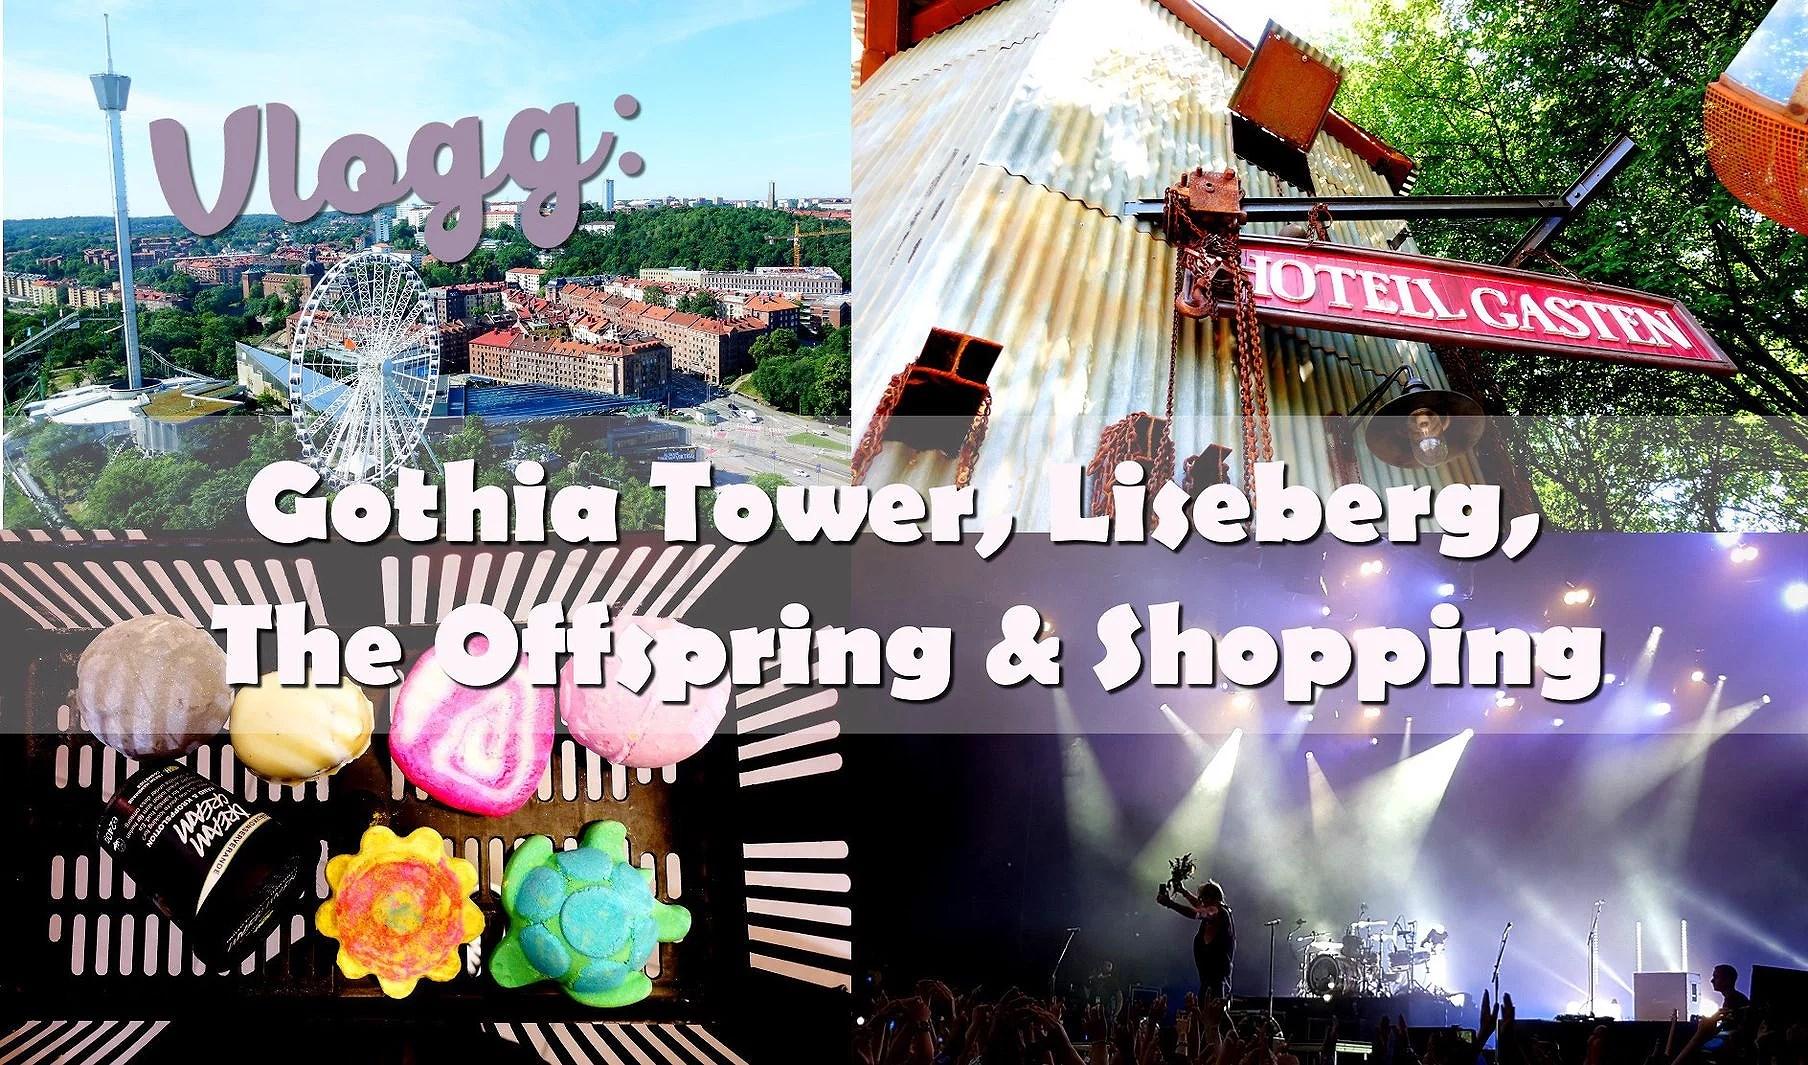 Vlogg: Gothia Tower, Liseberg, The Offspring & Shopping